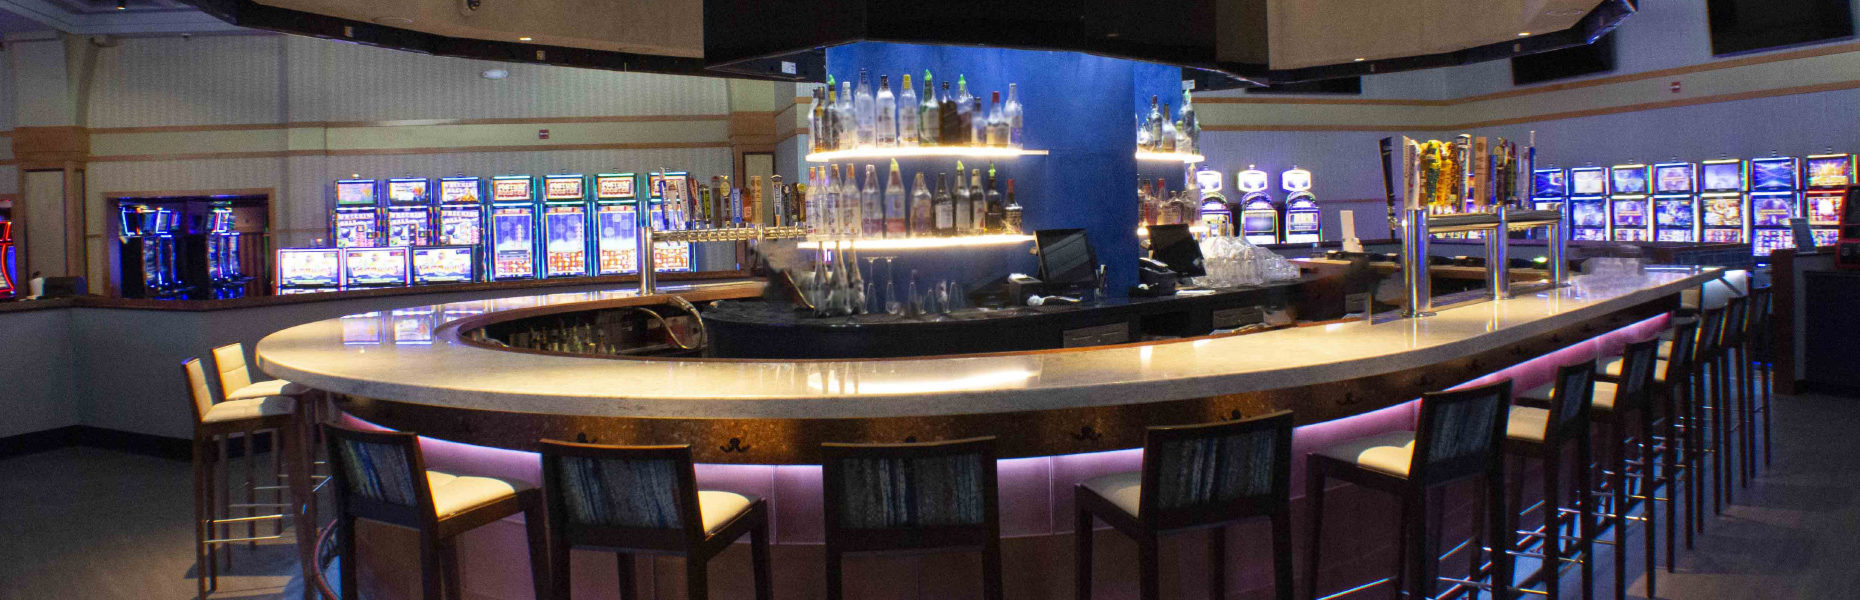 Saratogo Casino, Saratogo Springs, NY. Custom Quartz Bar  Material: Wilsonart Ascent General Contractor: Consigli